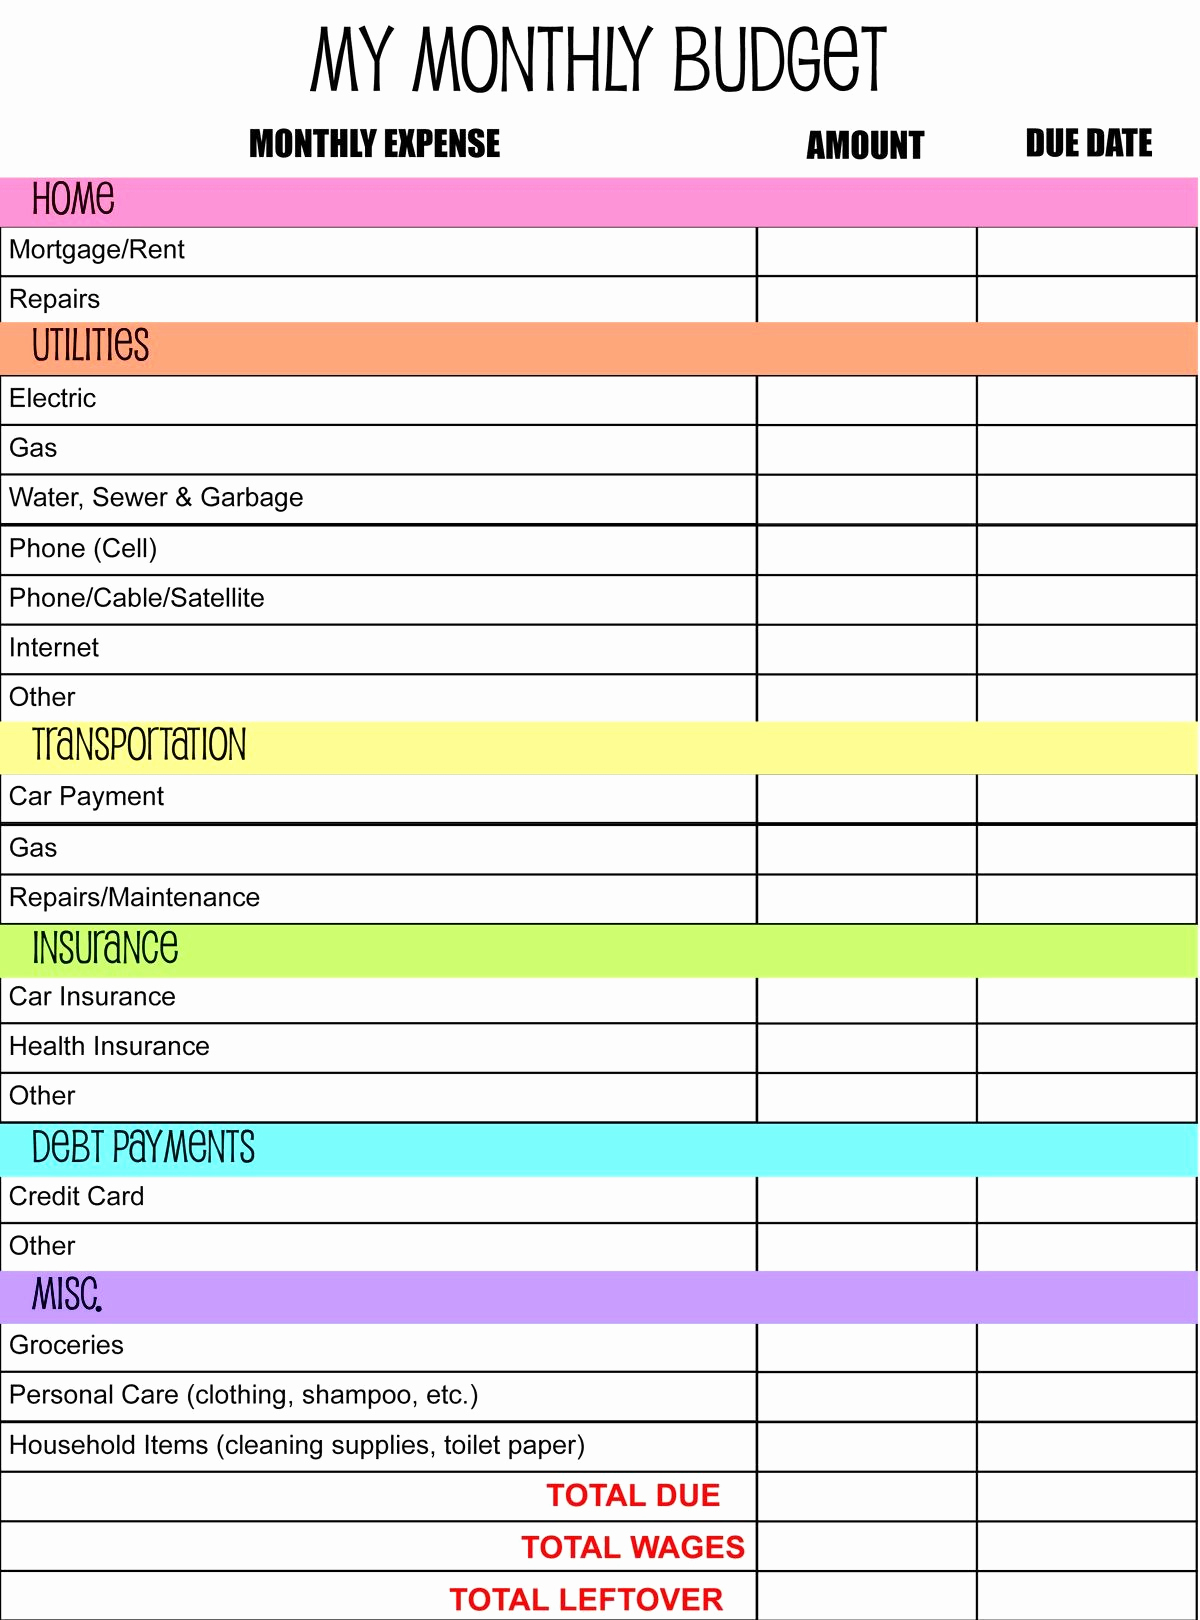 Car Shopping Spreadsheet Intended For Health Insurance Comparison Spreadsheet Template New Car Shopping